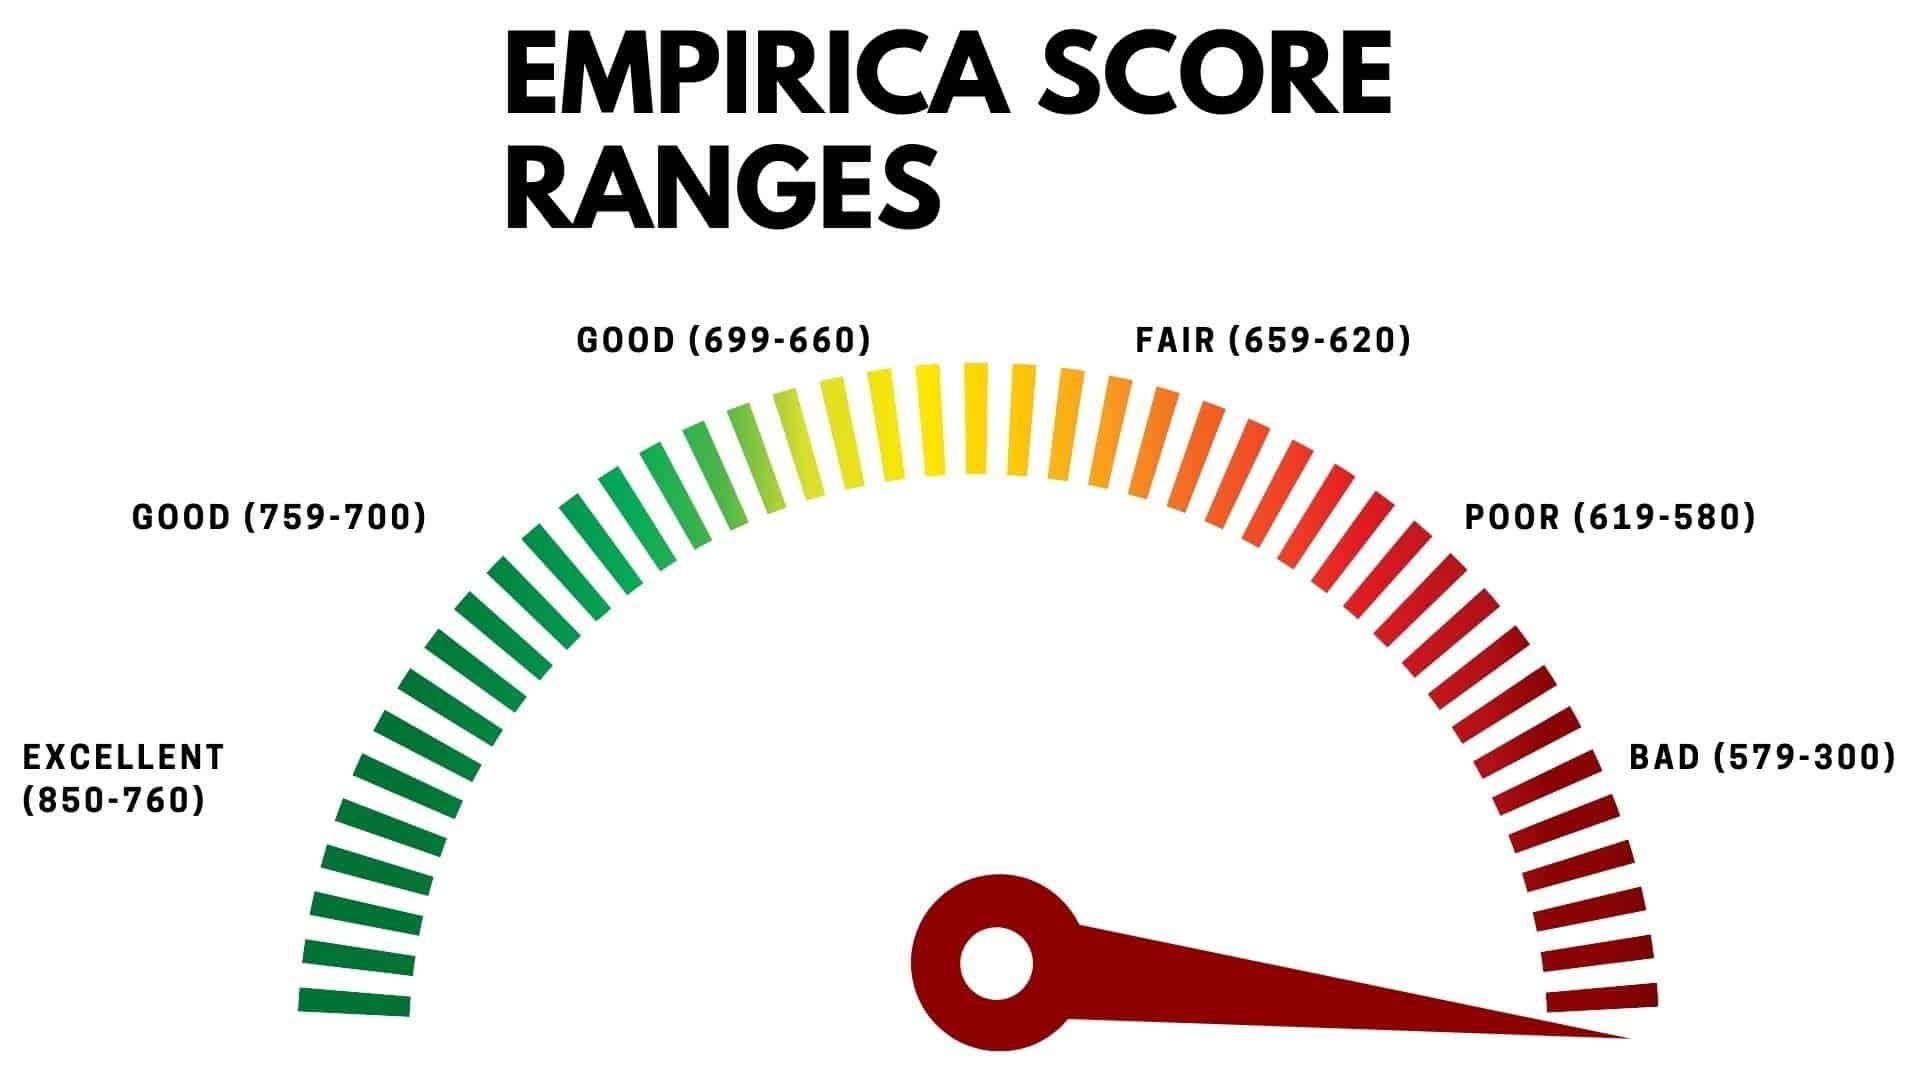 Empirica Ranges